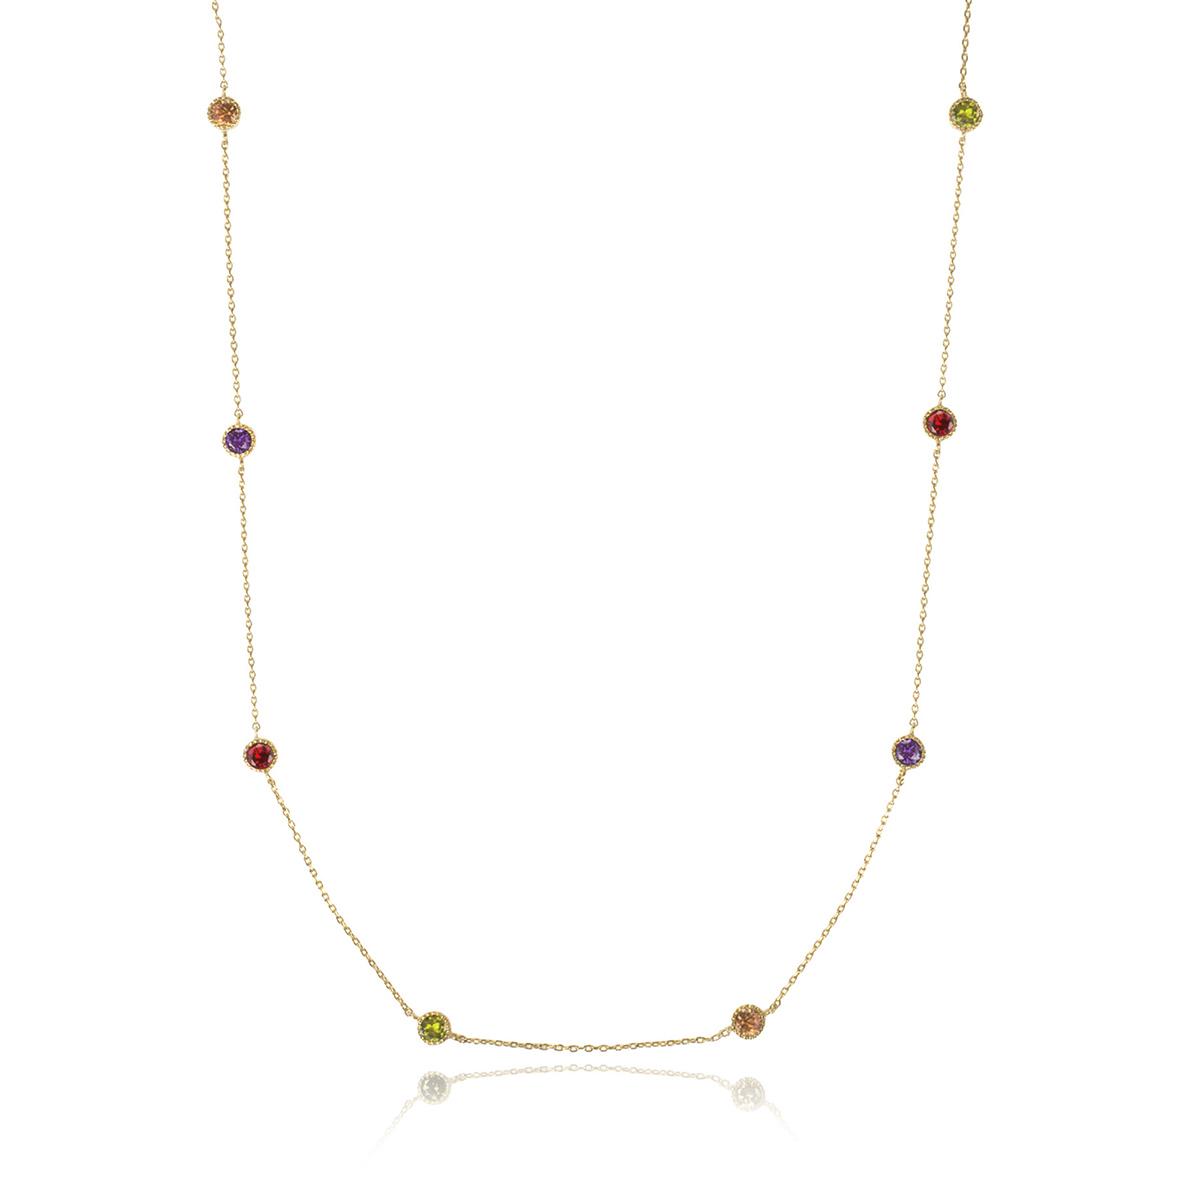 Colar 110 cm de Zircônia Colorida Redonda Semijoia em Ouro 18K  - Soloyou